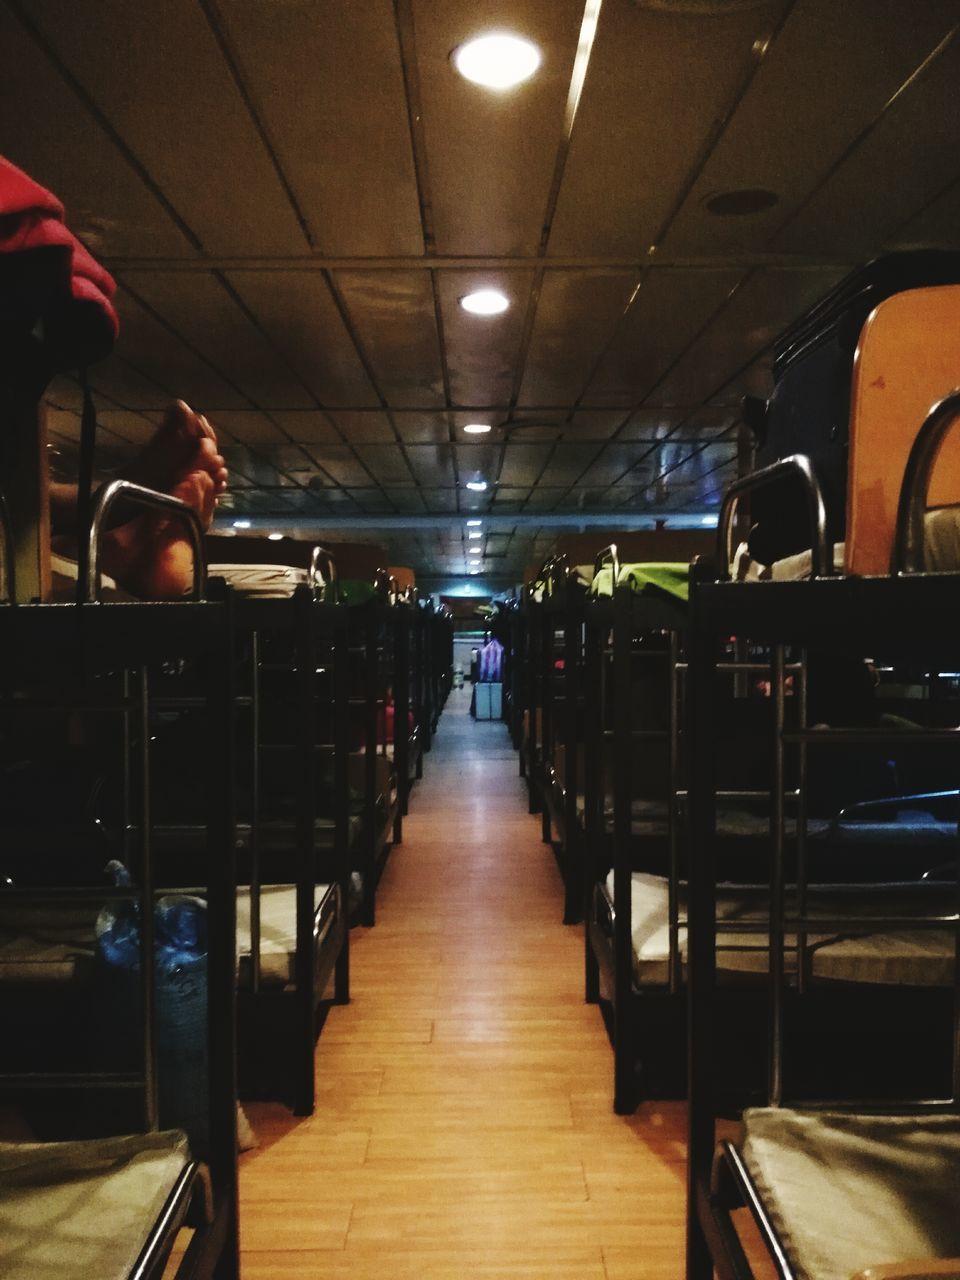 indoors, illuminated, vehicle seat, real people, transportation, day